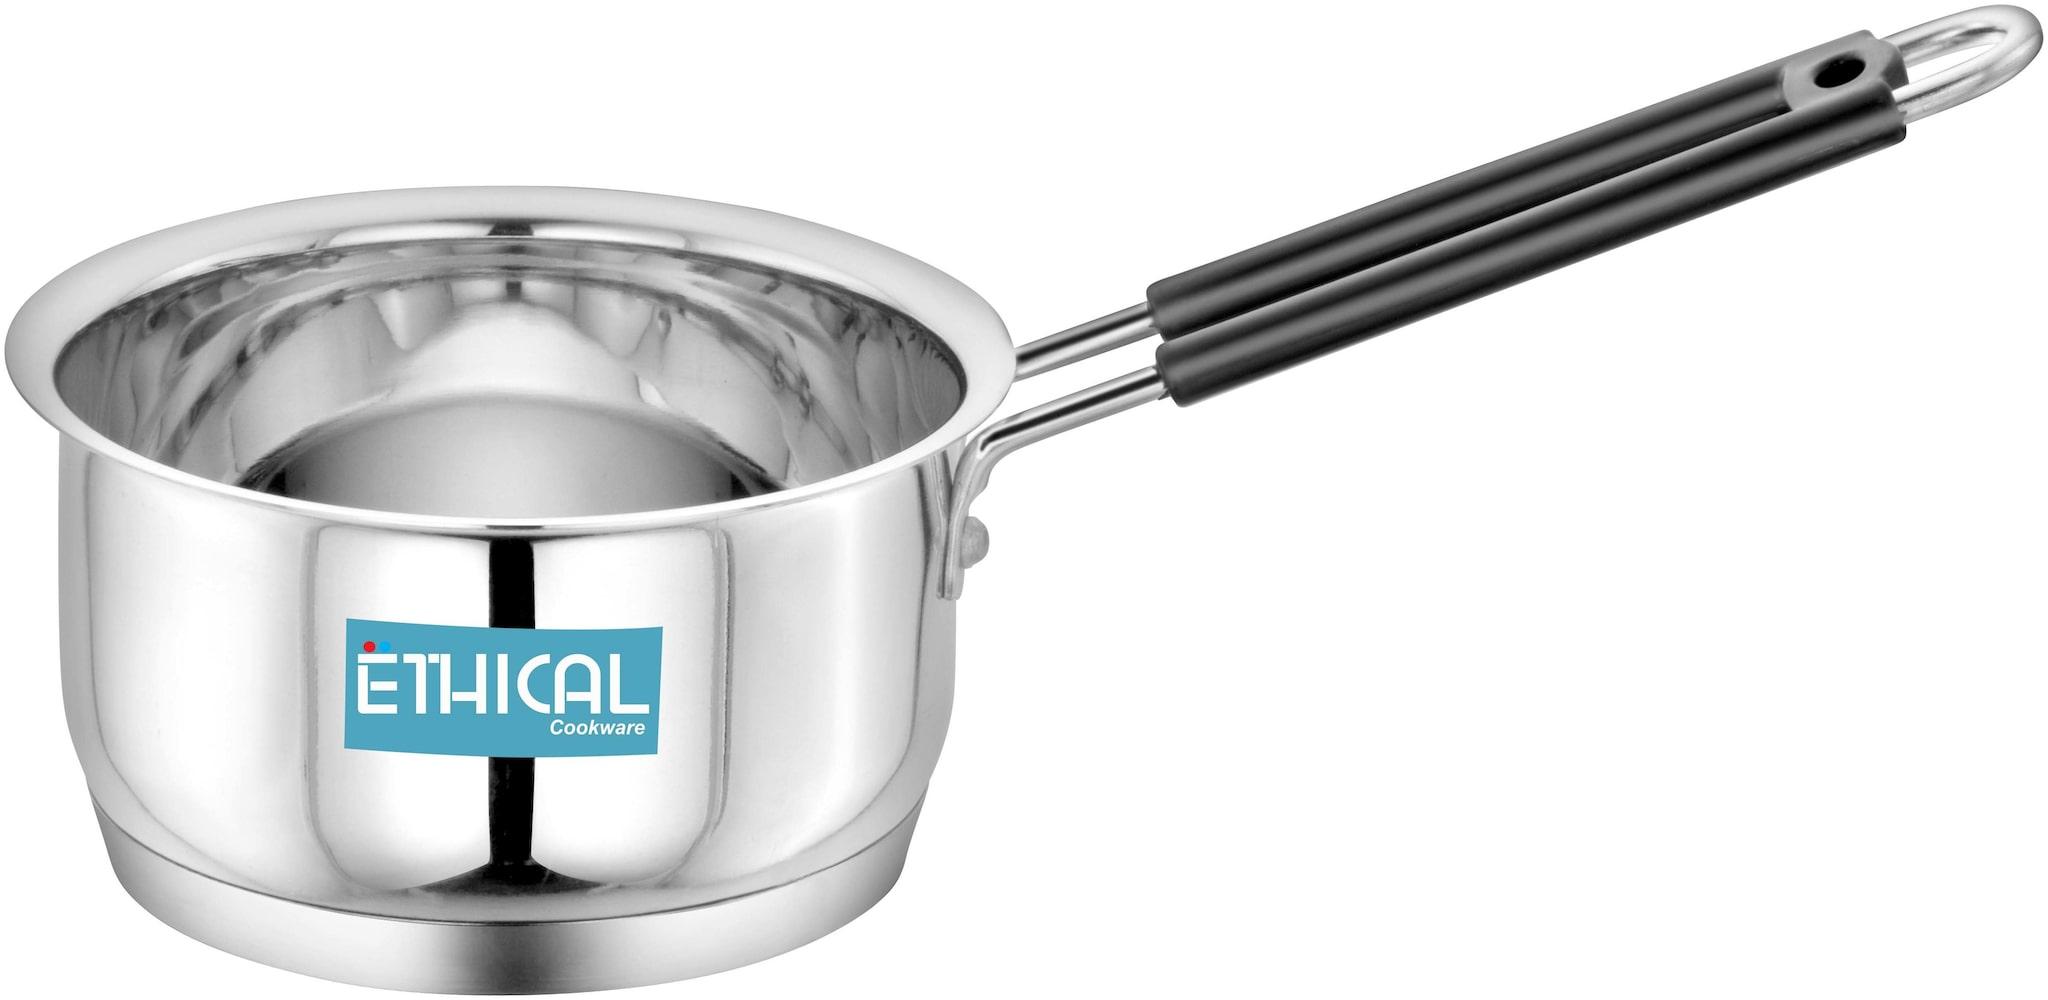 Ethical Fineart Stainless Steel Encapsulated Bottom Sauce Pan 2.10 L / 19 cm diameter